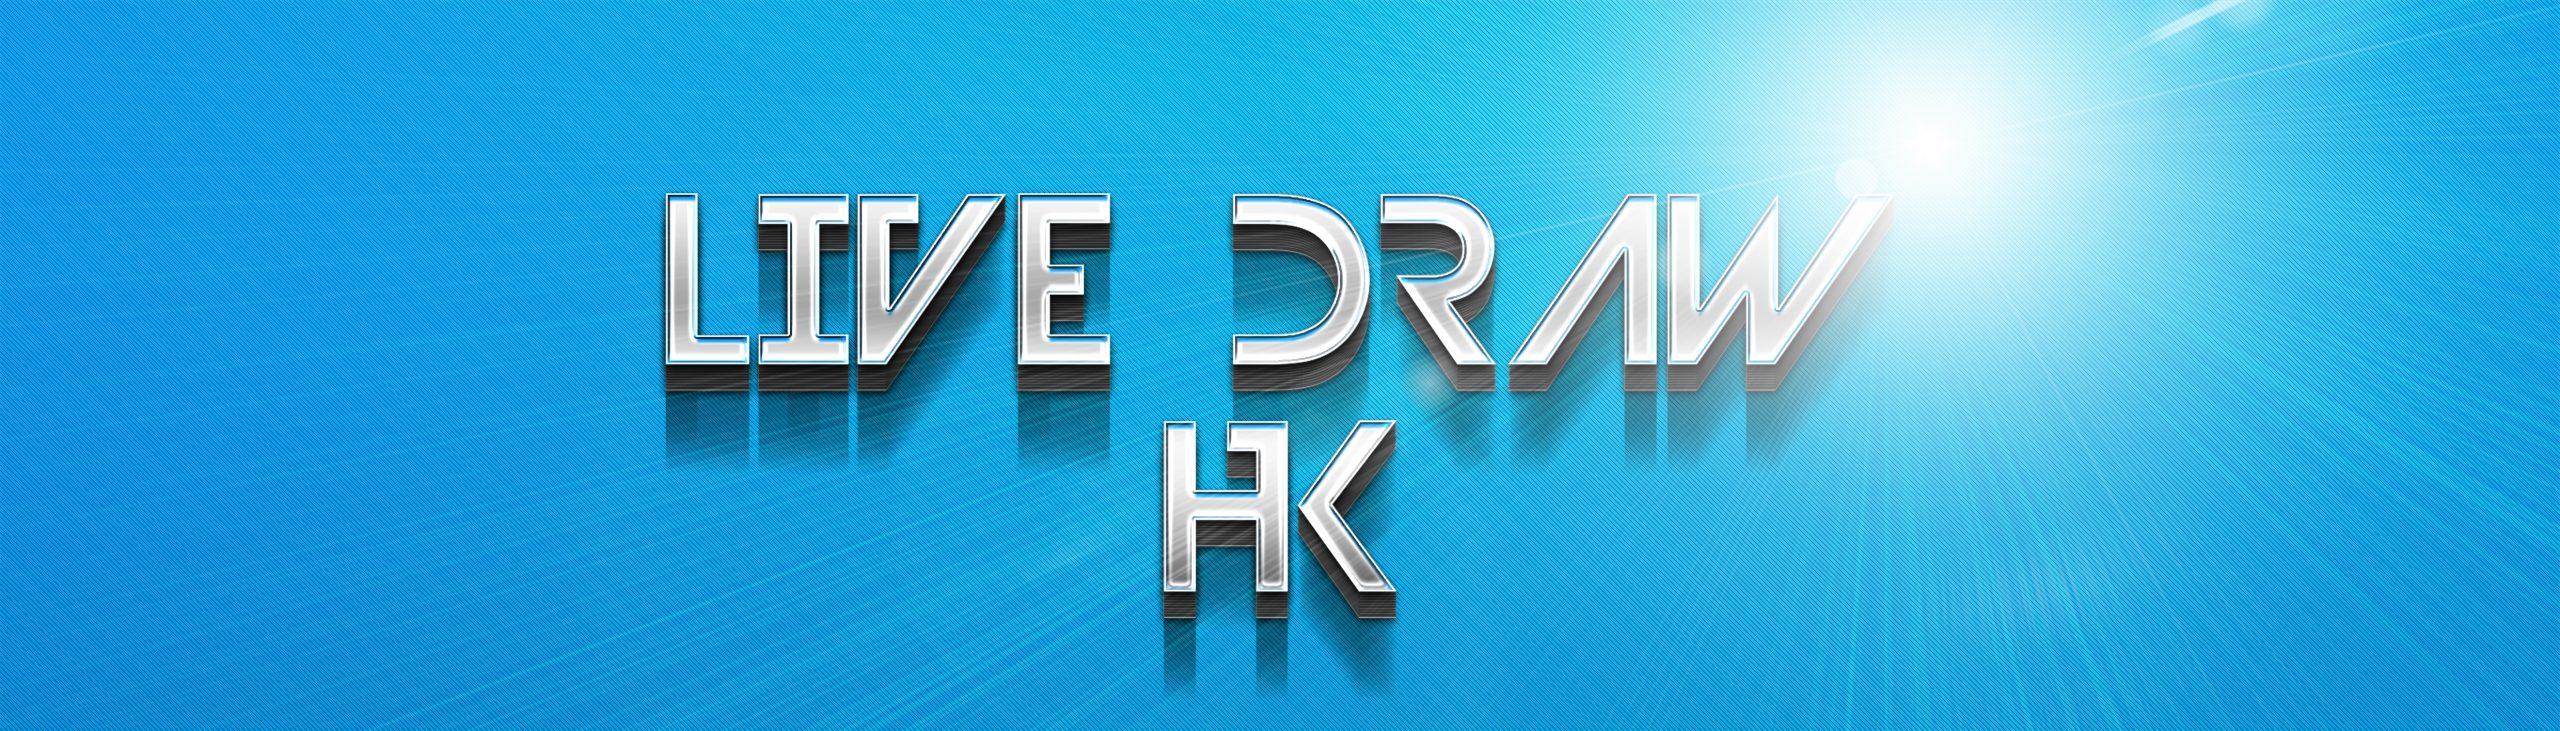 Live Draw Hongkong 6D Tercepat